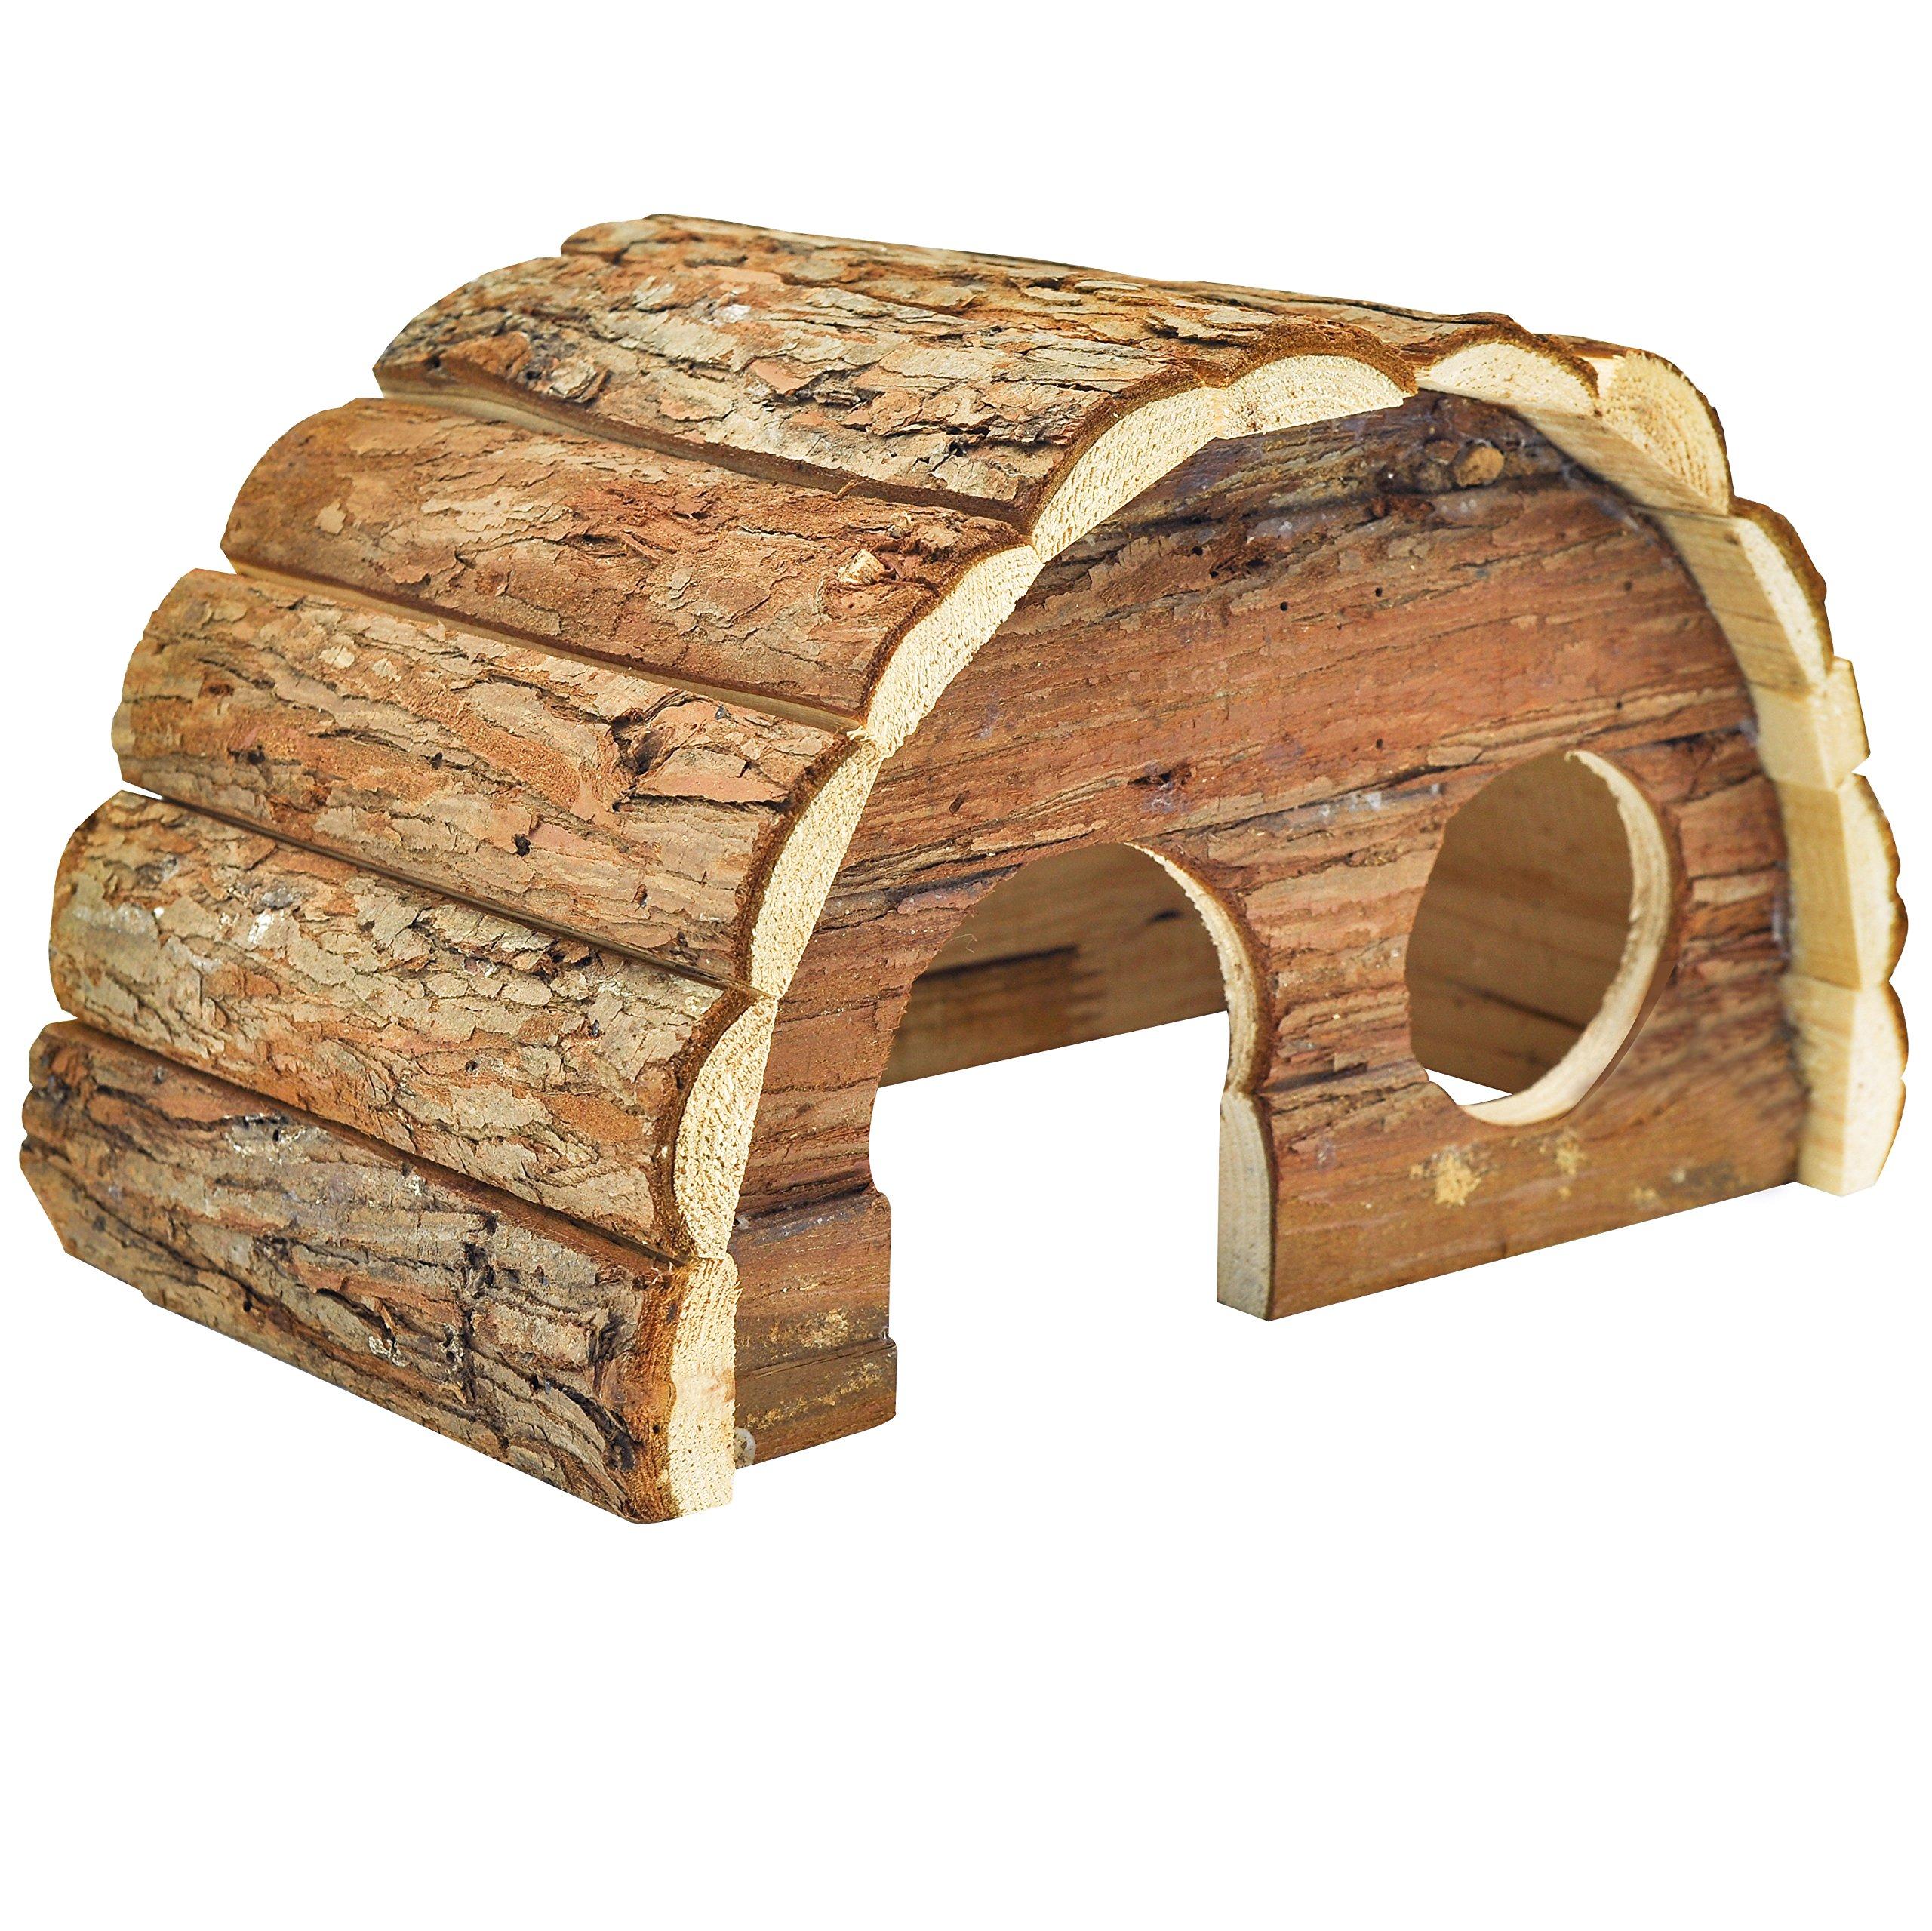 Niteangel Natural Wooden Houses (9.8'' x 6.3'' x 5.9'')